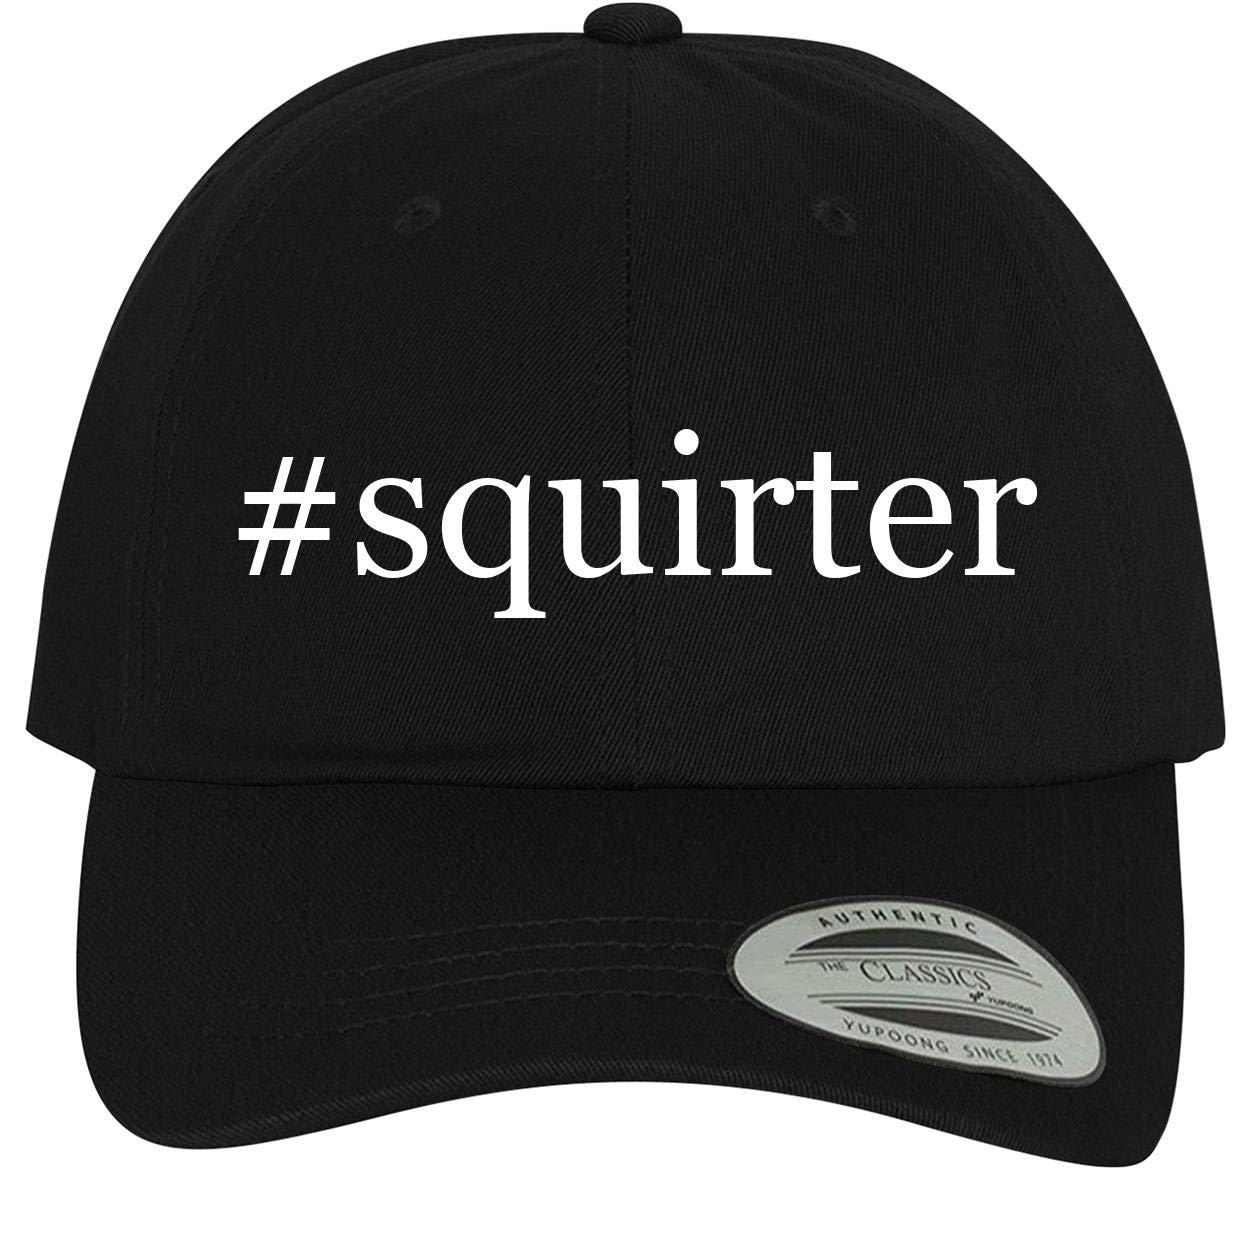 Comfortable Dad Hat Baseball Cap BH Cool Designs #Squirter